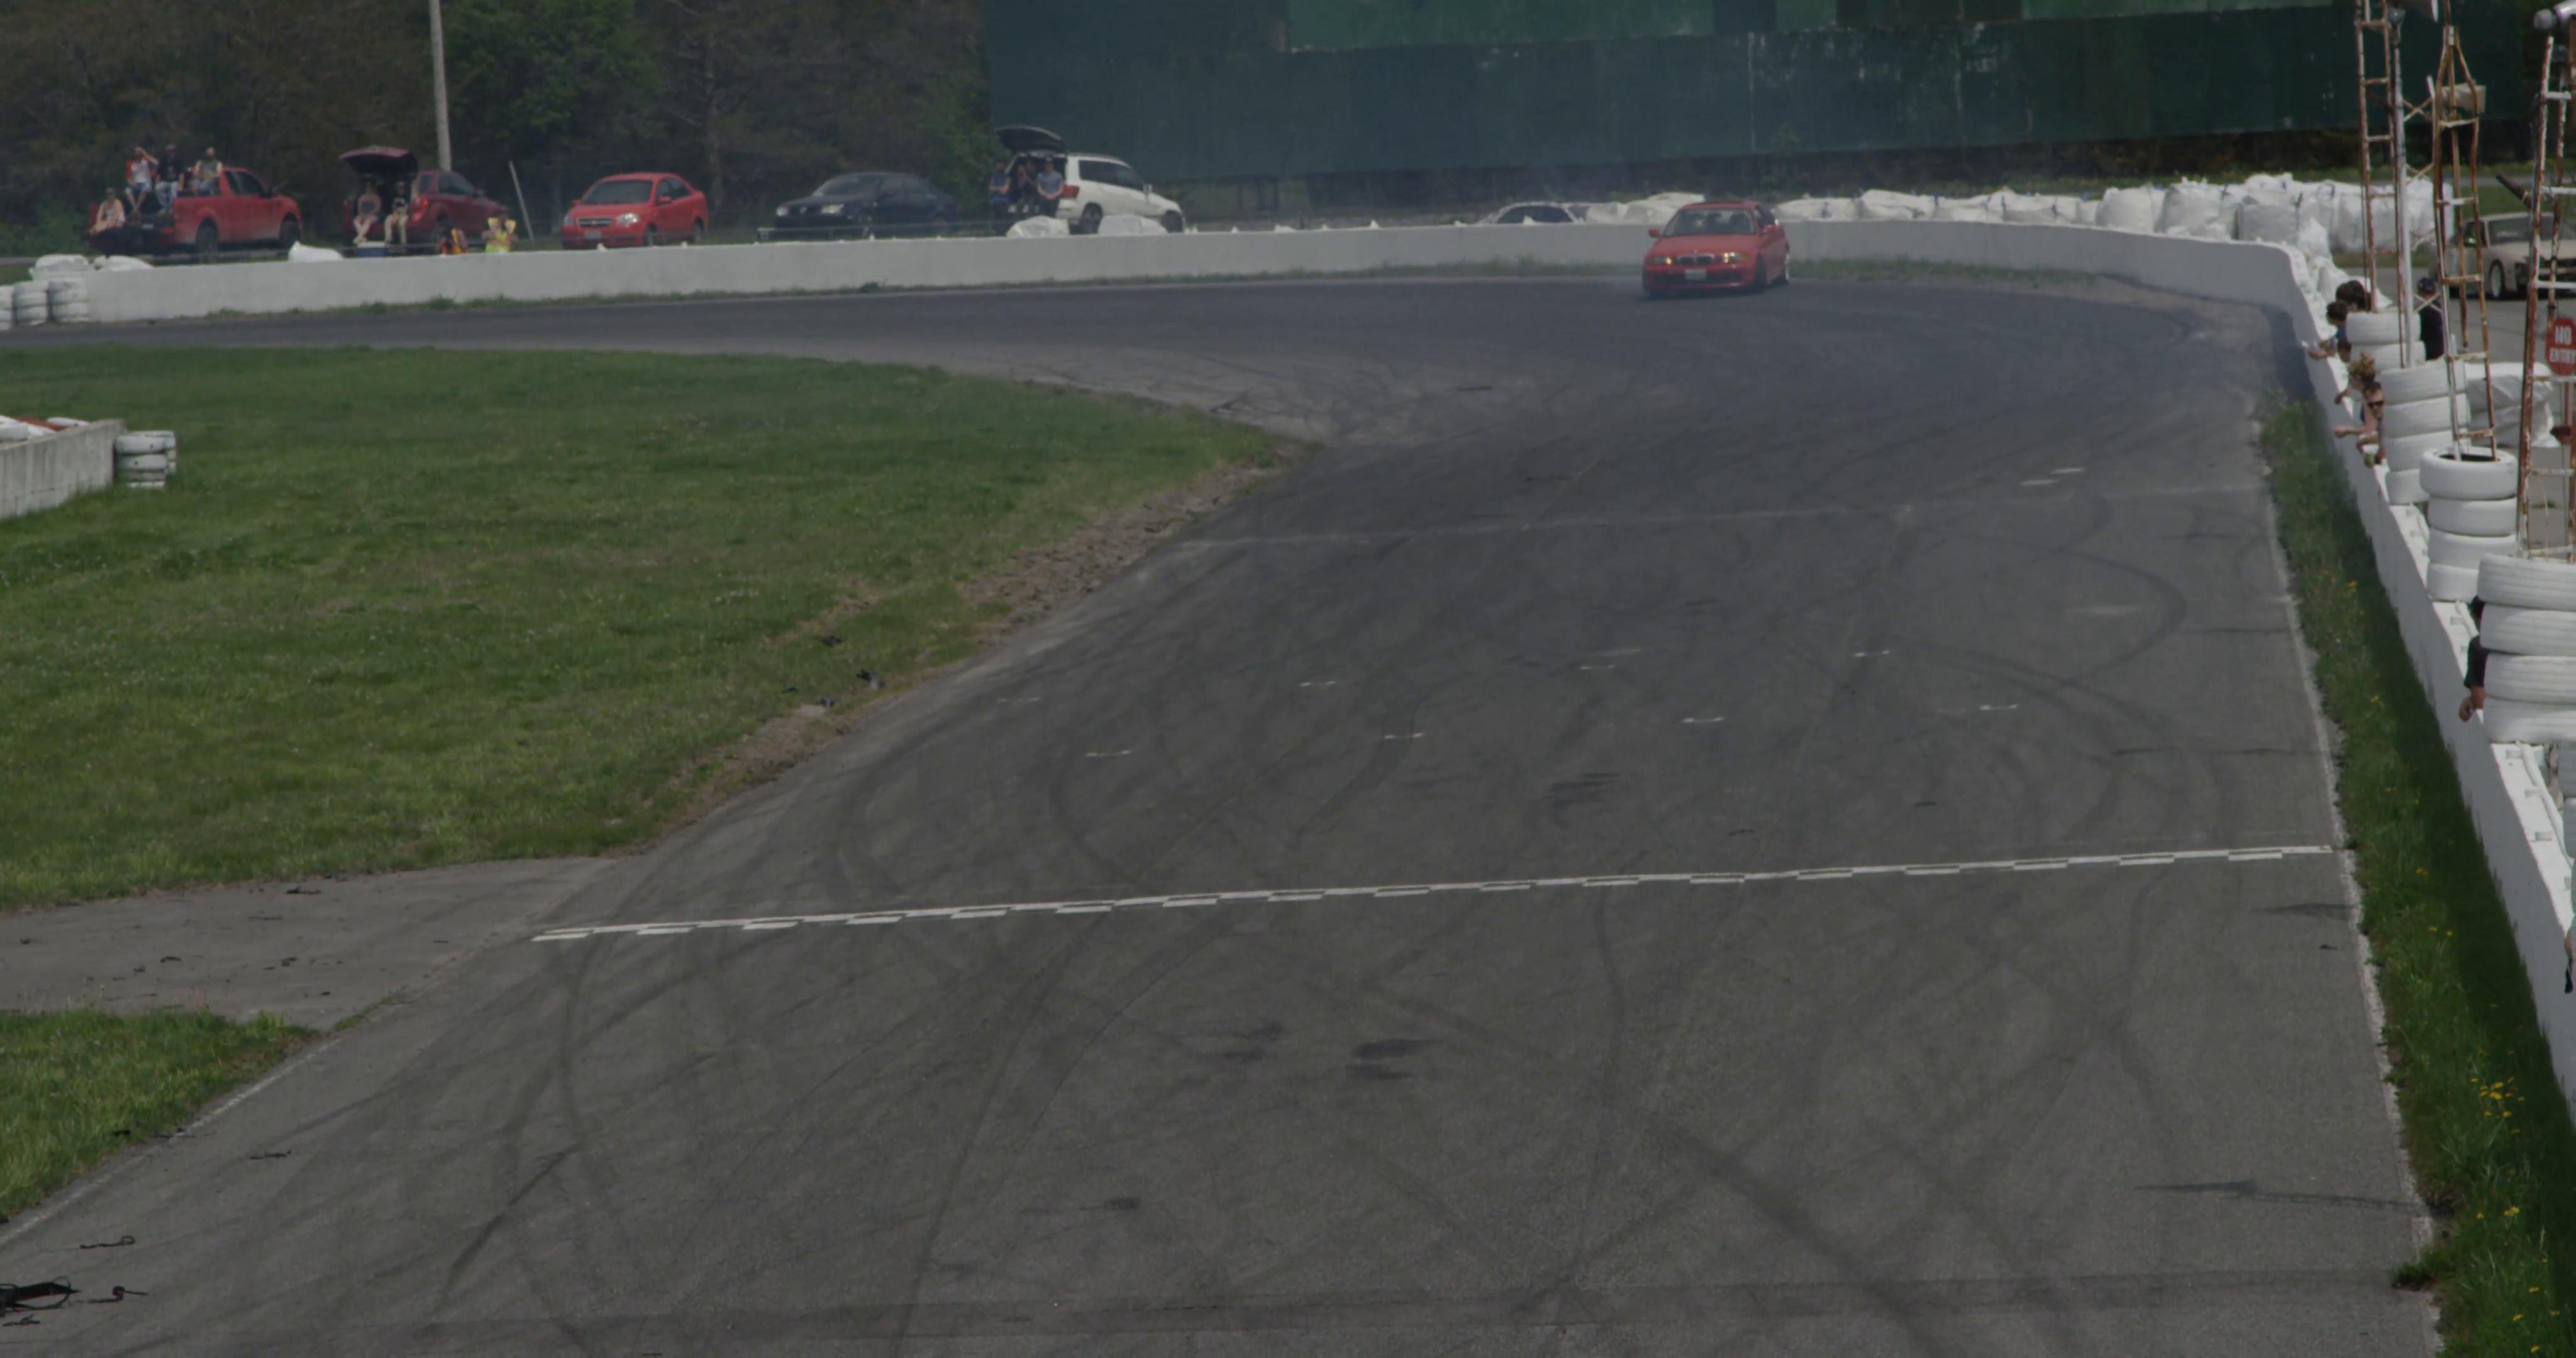 Drifting track photo